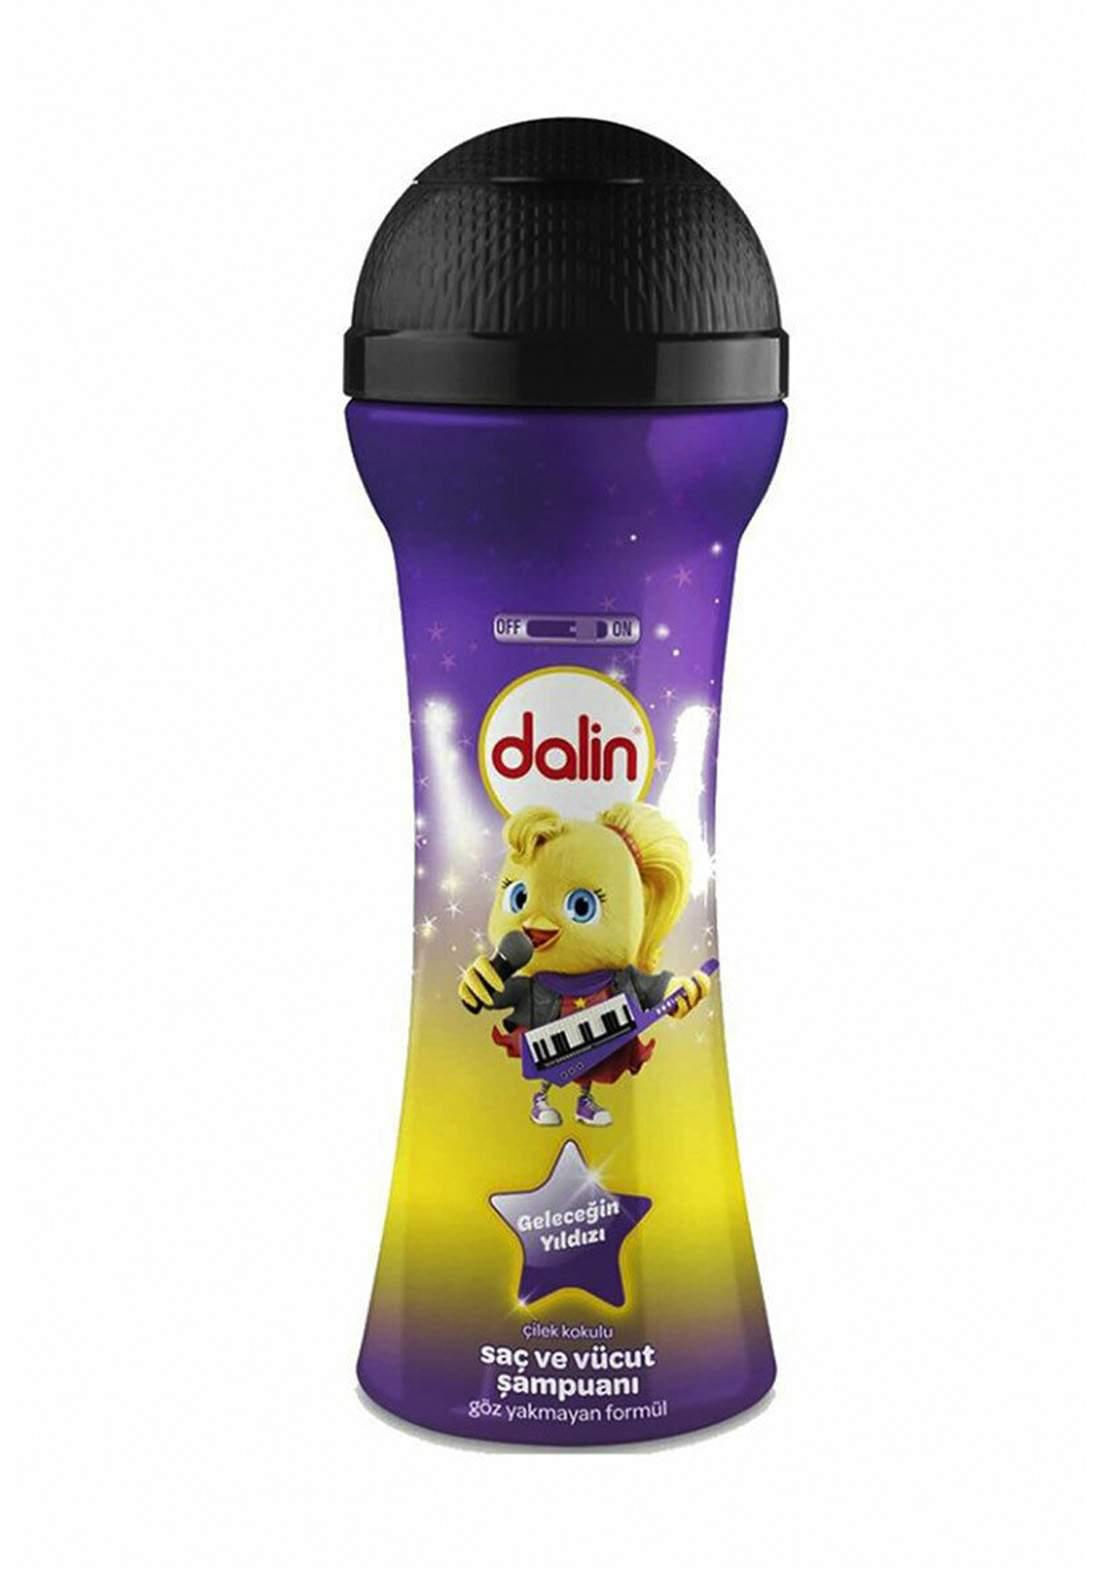 Dalin The Star Of The Future Hair Body Shampoo Strawberry 300 ml شامبو شعر وجسم للأطفال